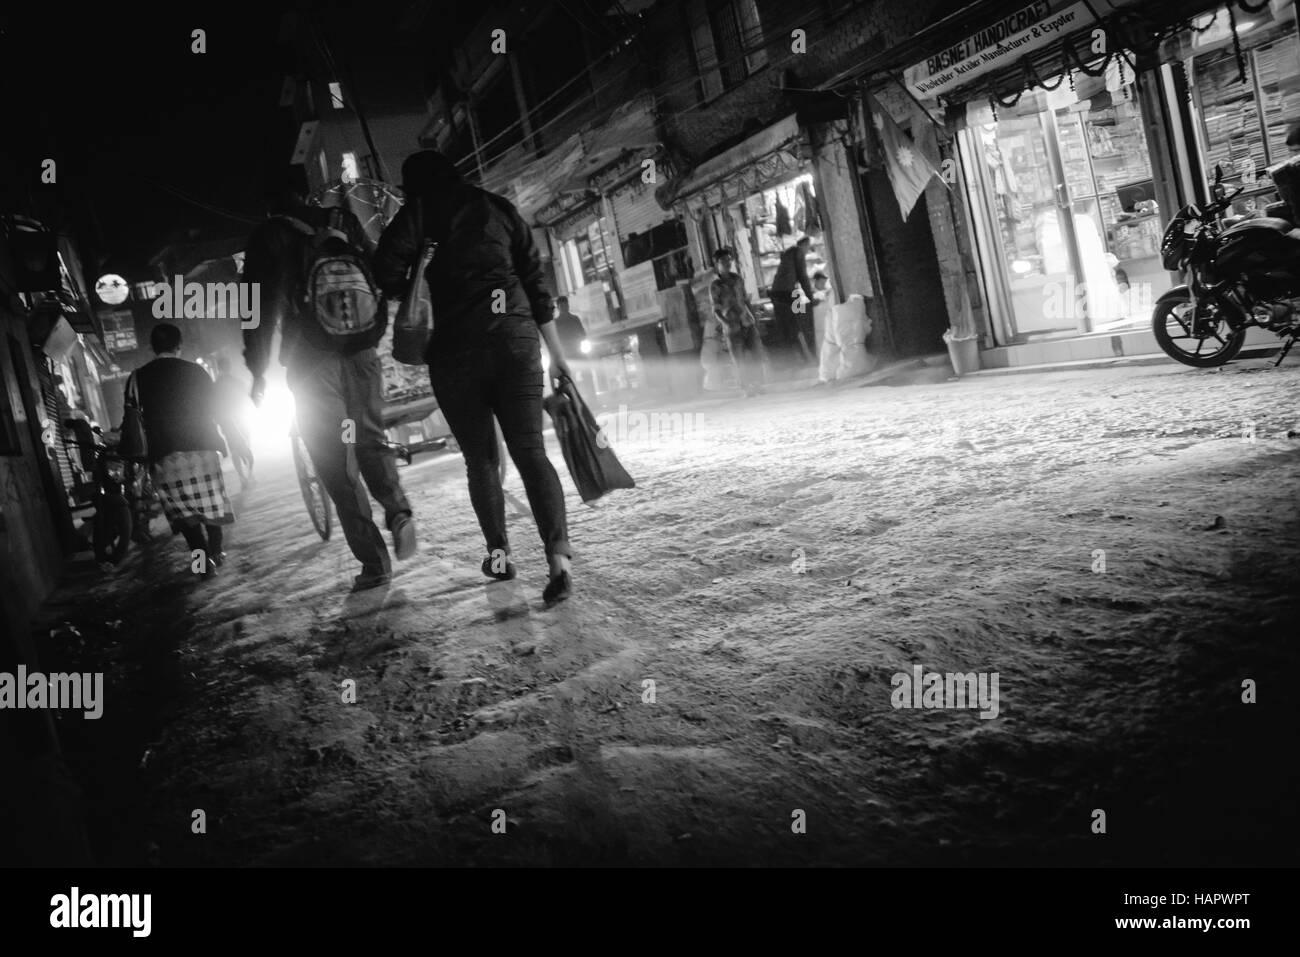 Streets of Thamel in Kathmandu Nepal at night - black & white - Stock Image